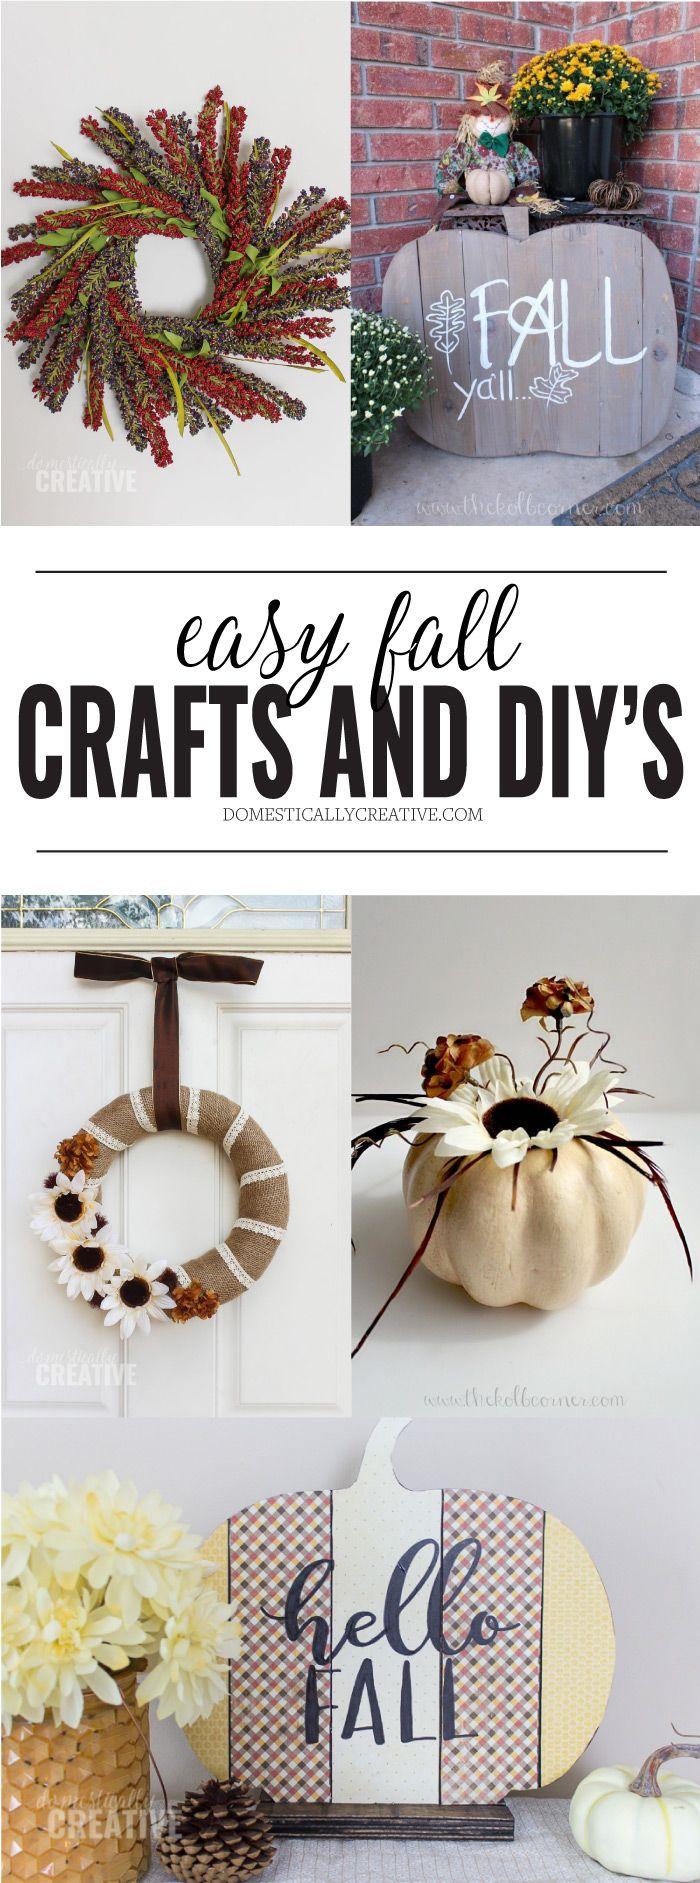 1104 best Fall/Autumn Ideas images on Pinterest   Diy fall crafts ...